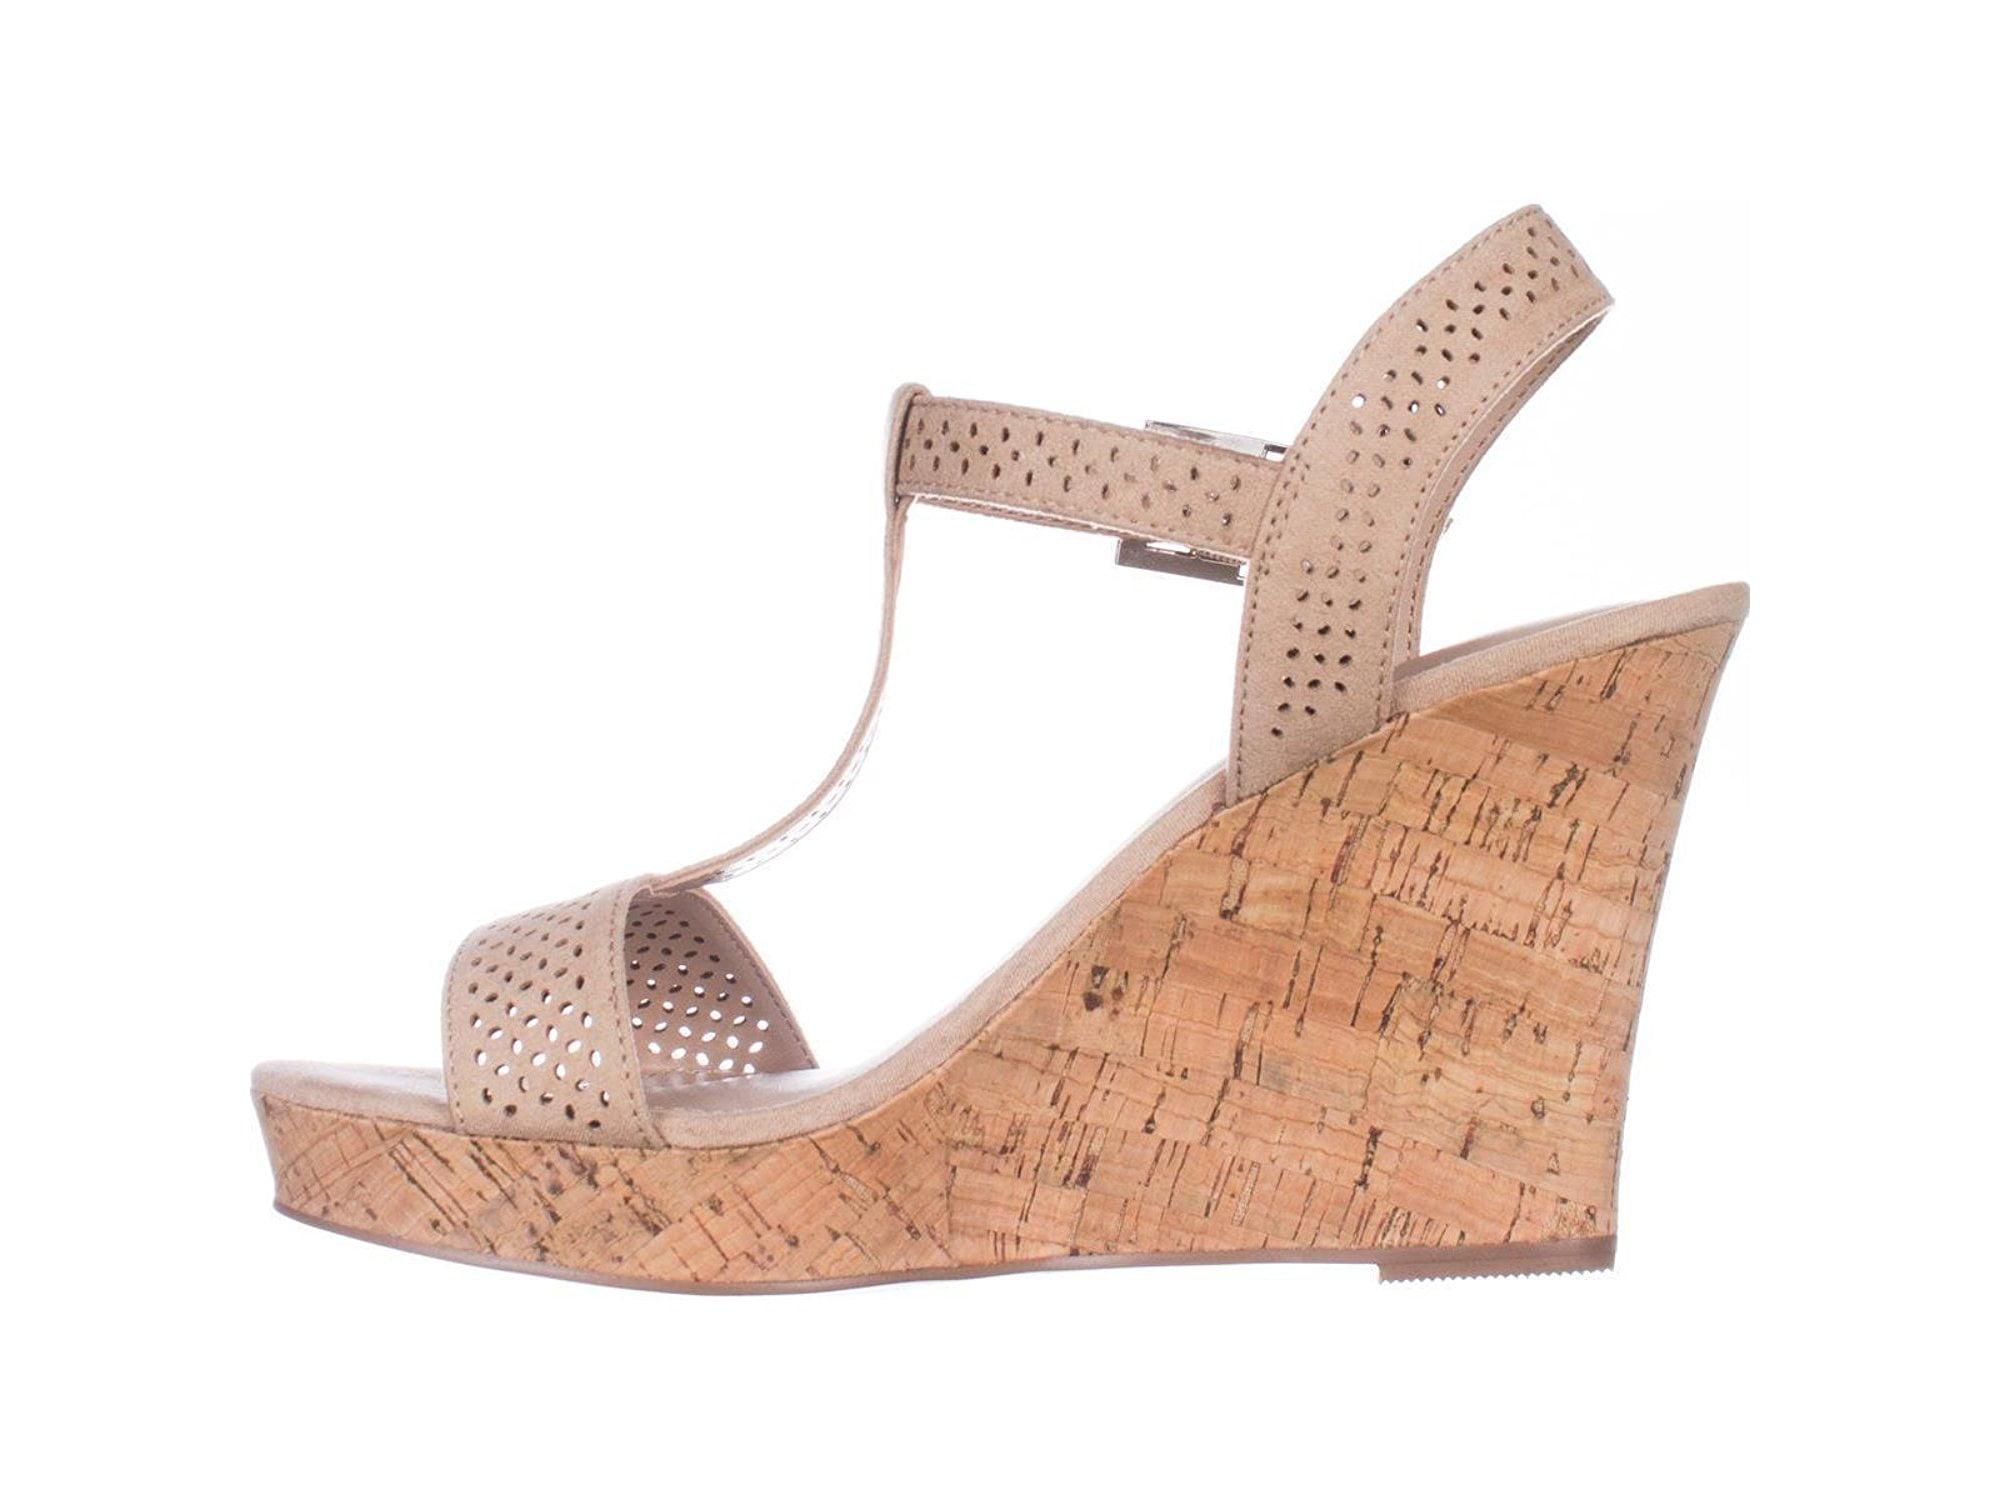 59ed99f11fe6 Charles Charles David Law Platform Wedge Sandals -